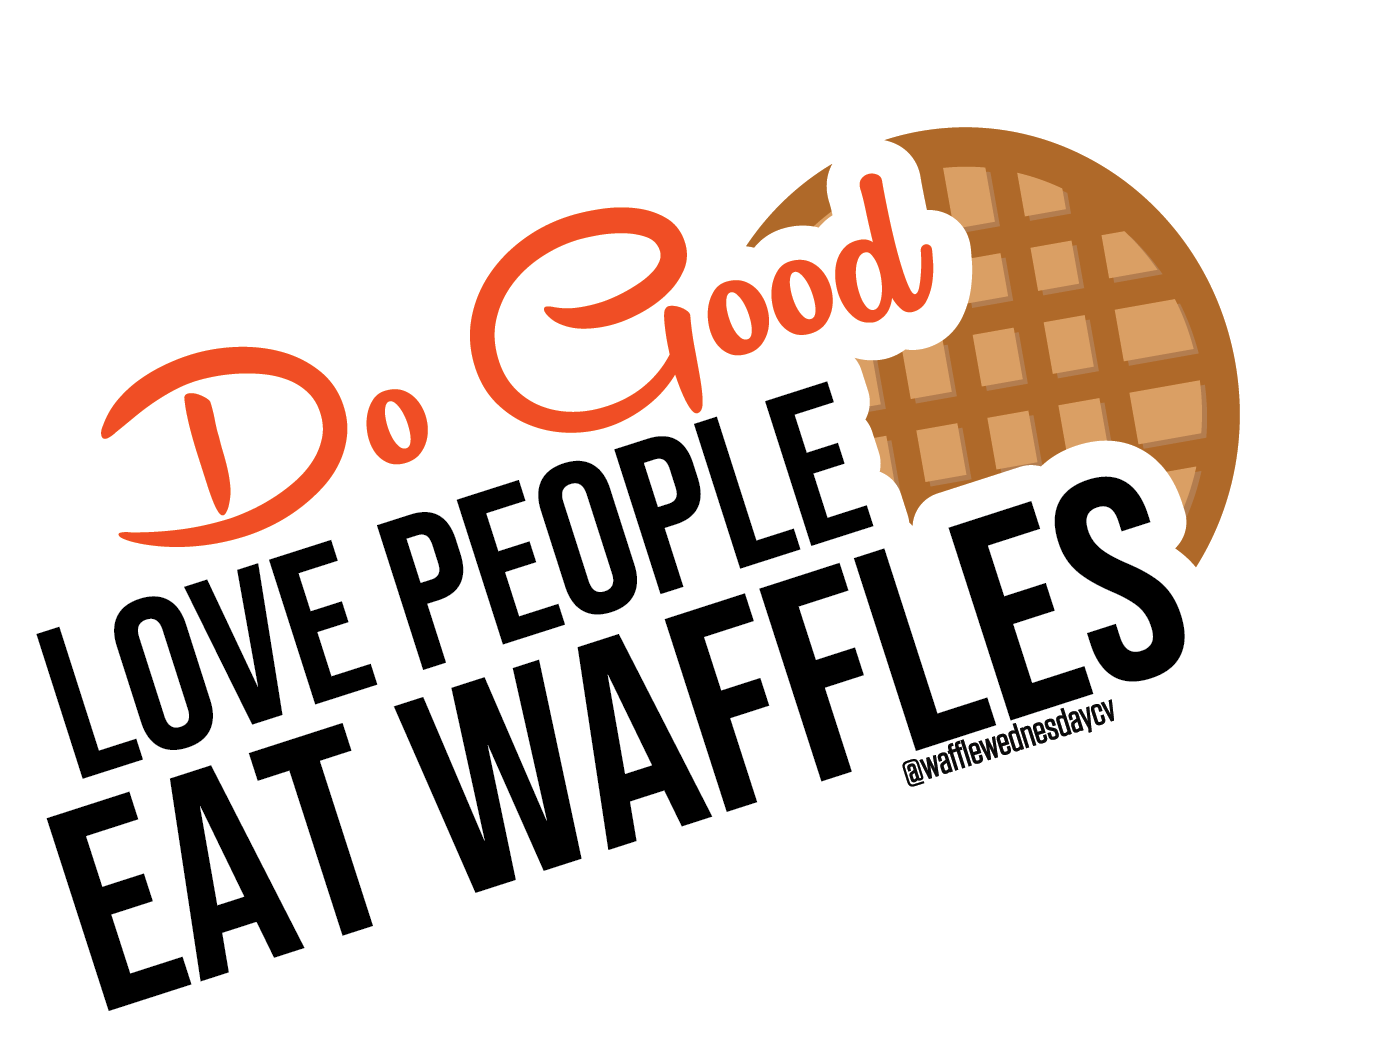 Waffle Wednesday CV